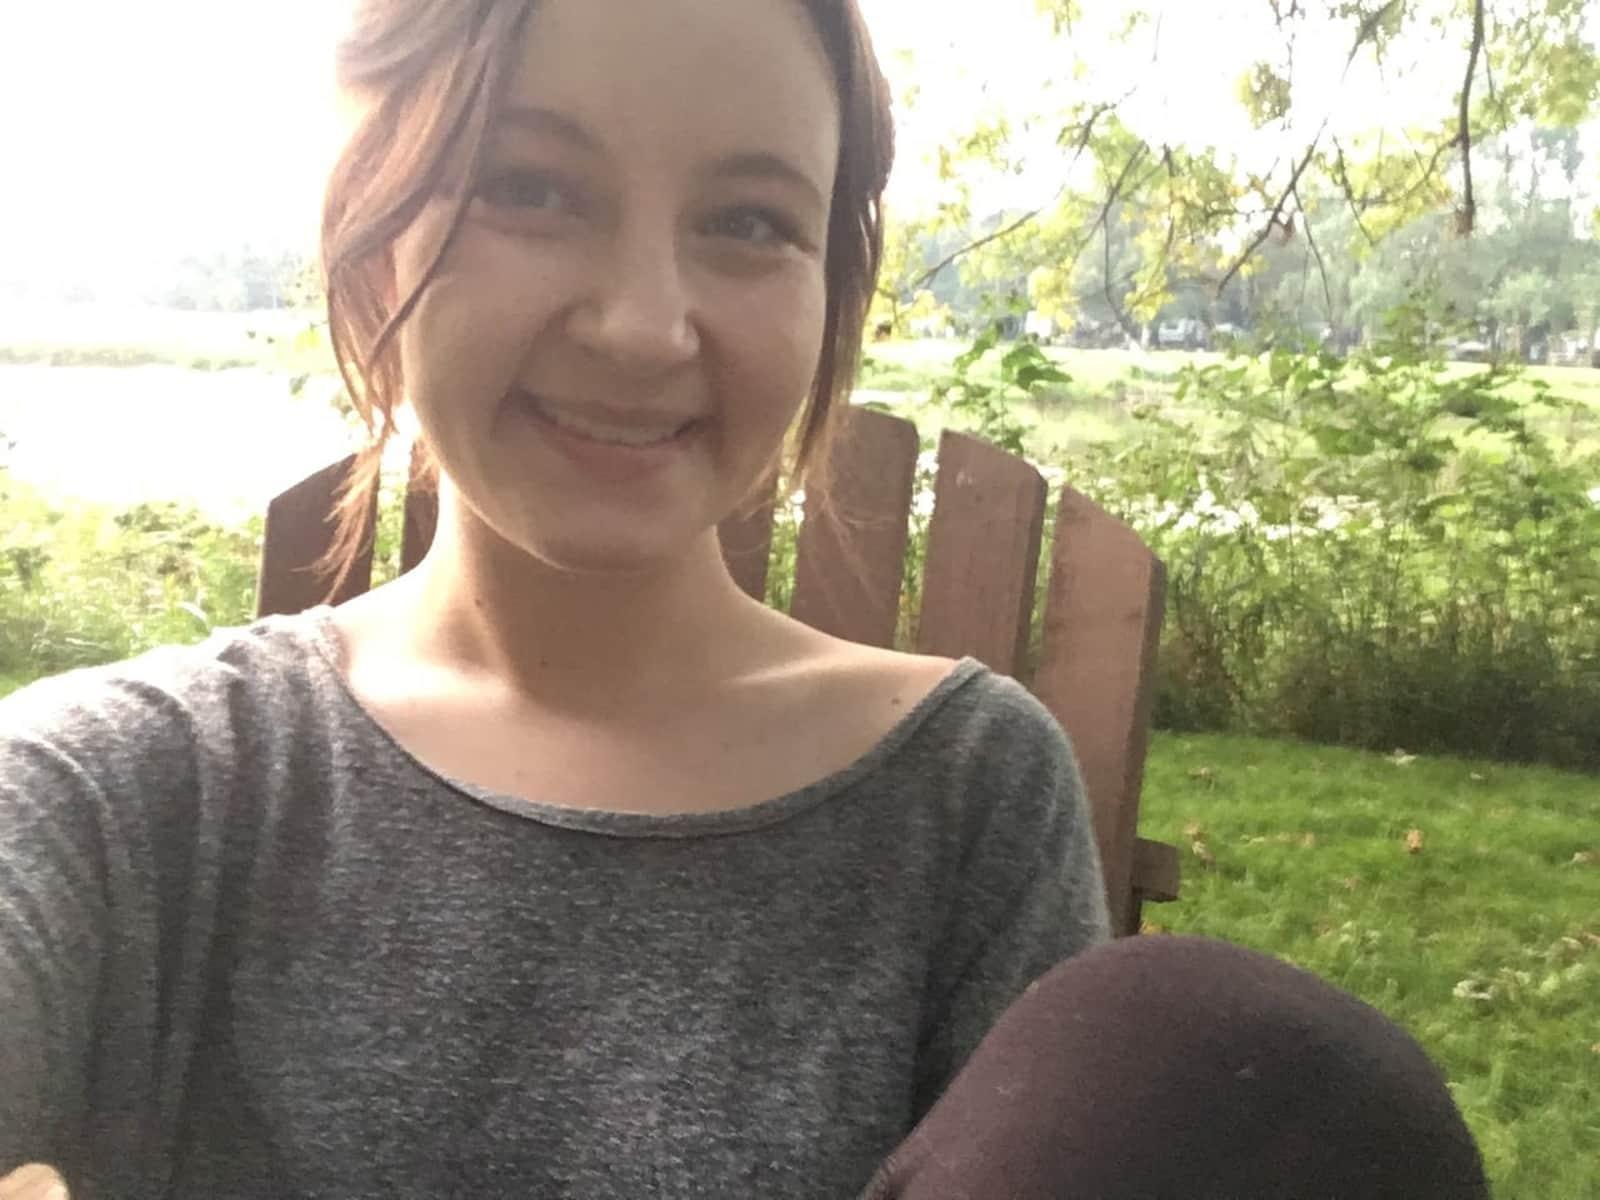 Trisha from Kitchener, Ontario, Canada